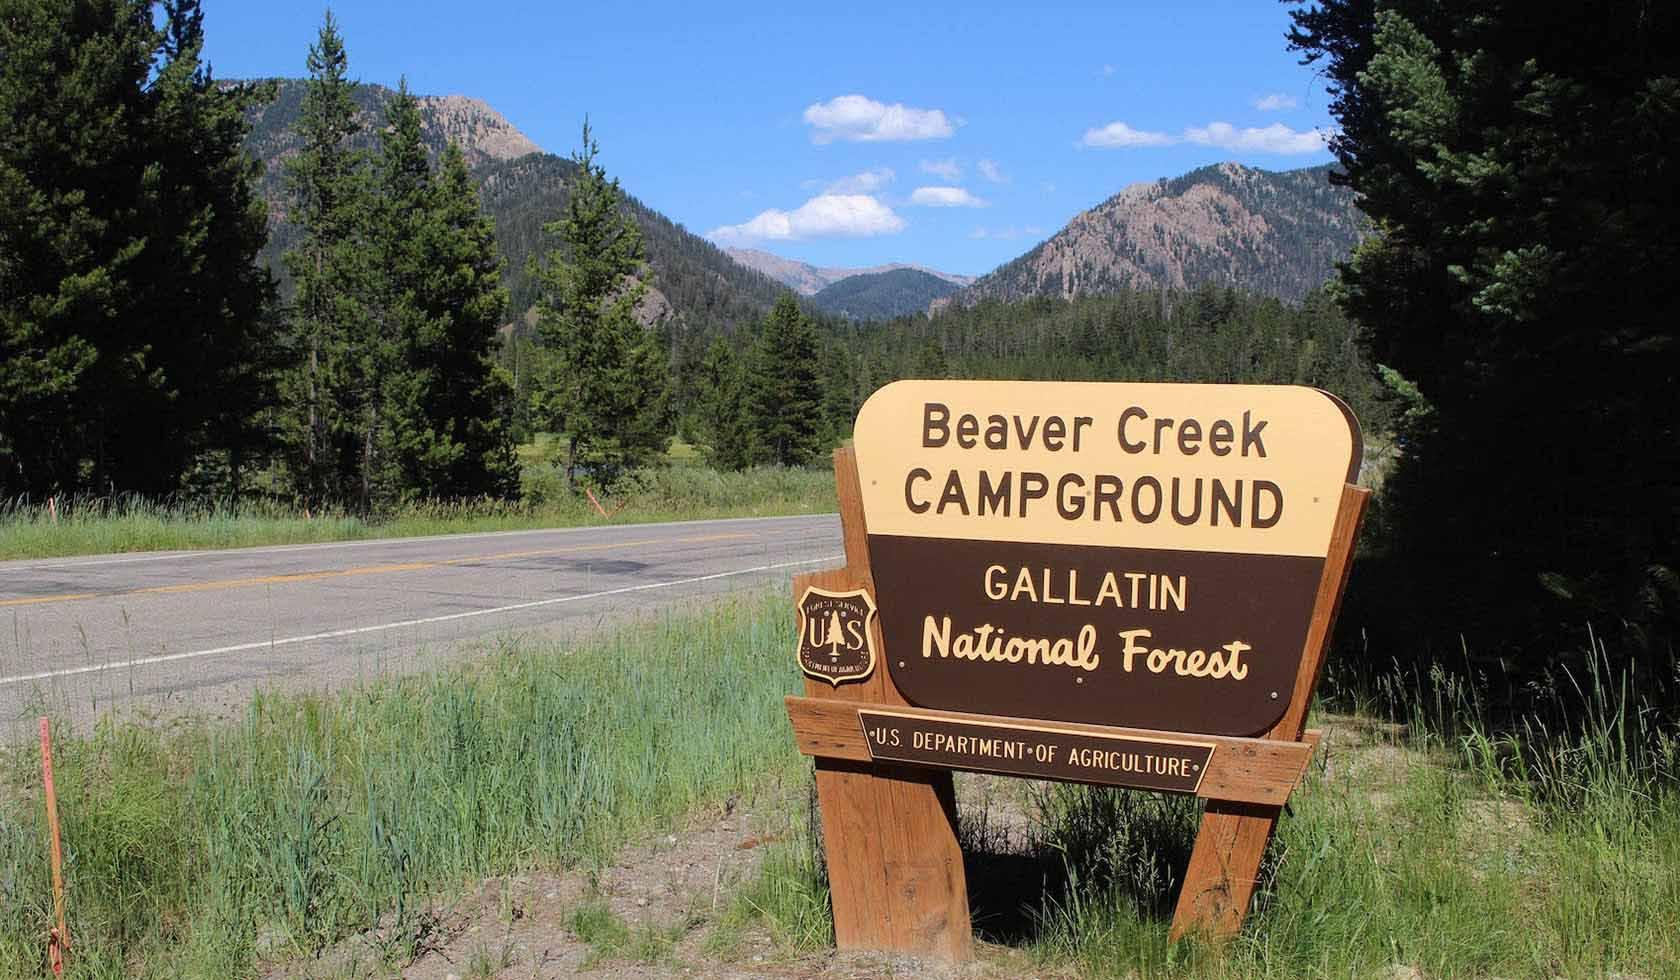 Beaver Creek Campground profile image